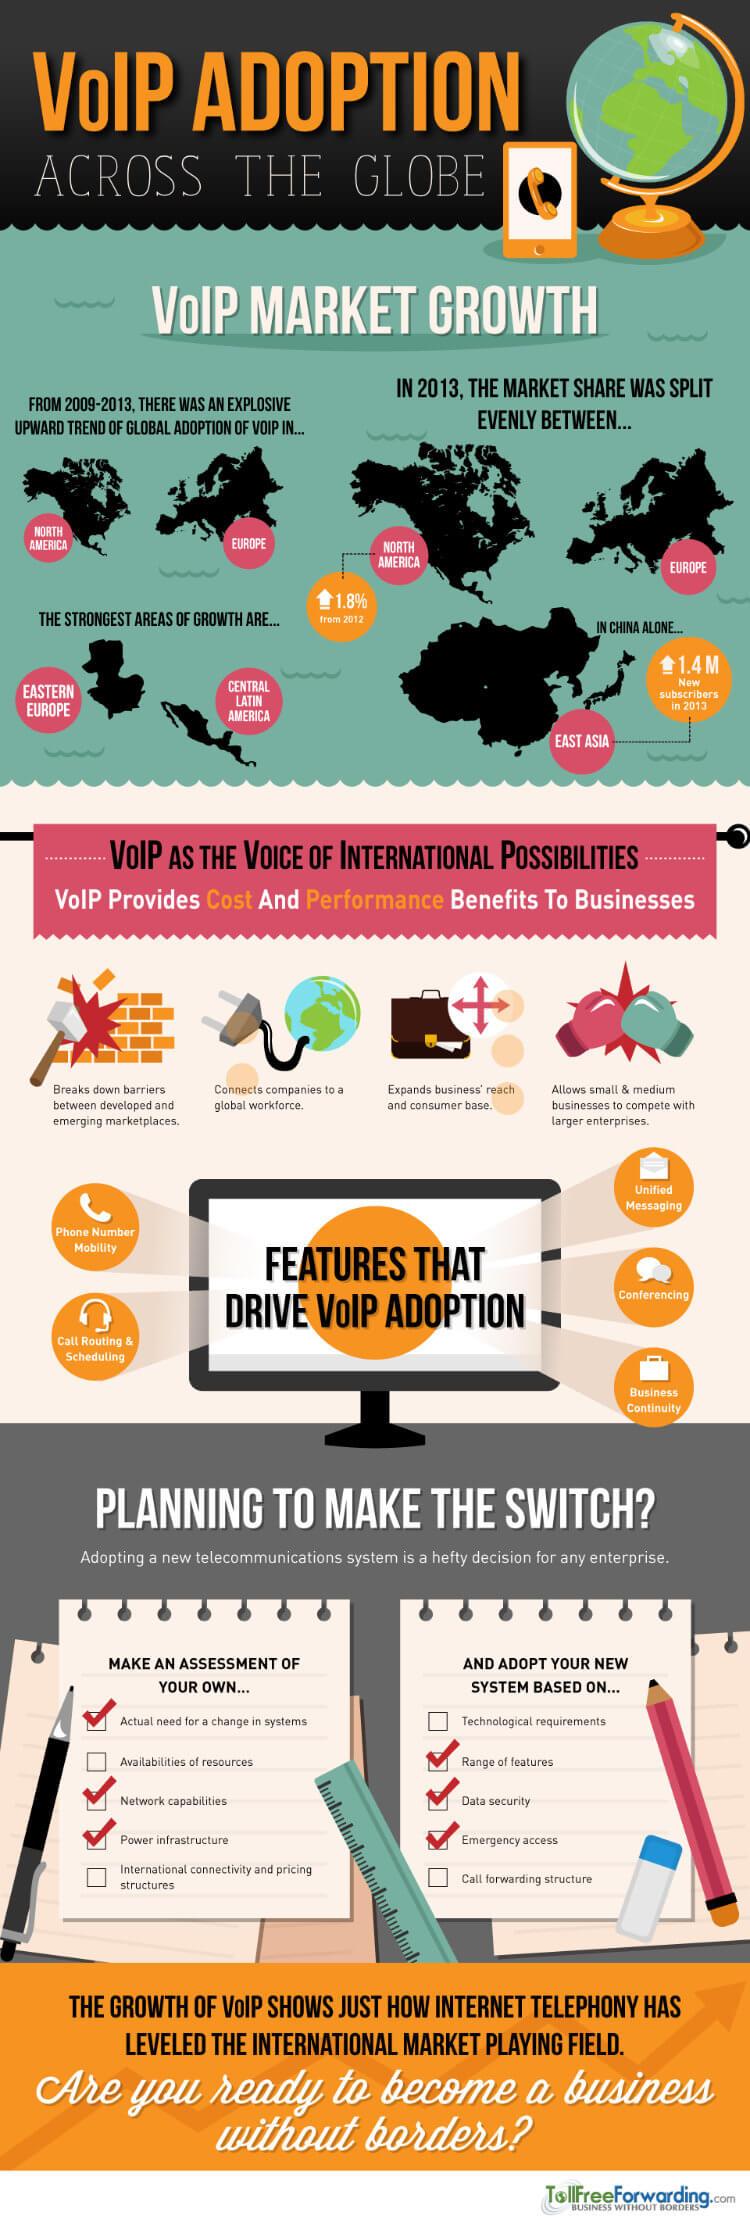 VOIP Adoption Across the Globe